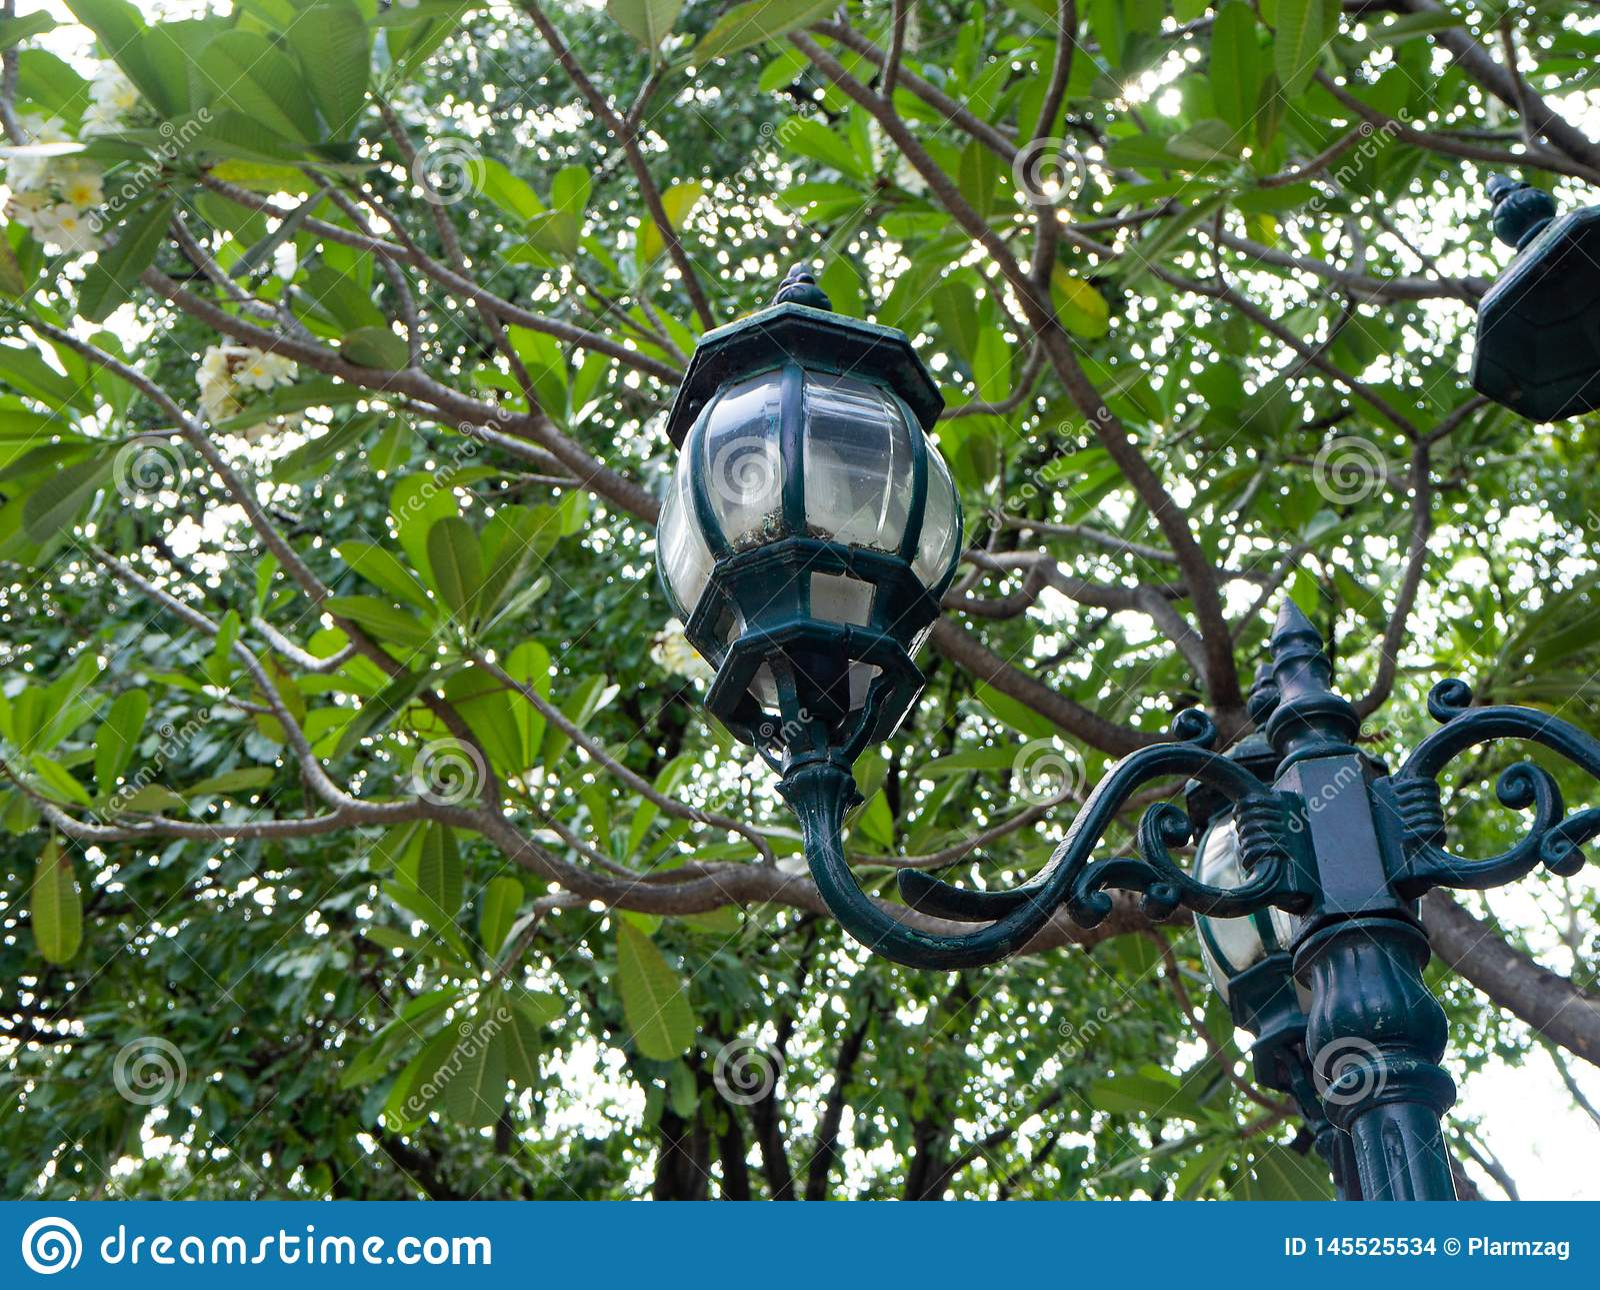 Lampenstraße in Prinzessin Mother Memorial Park, Bangkok, Thailand